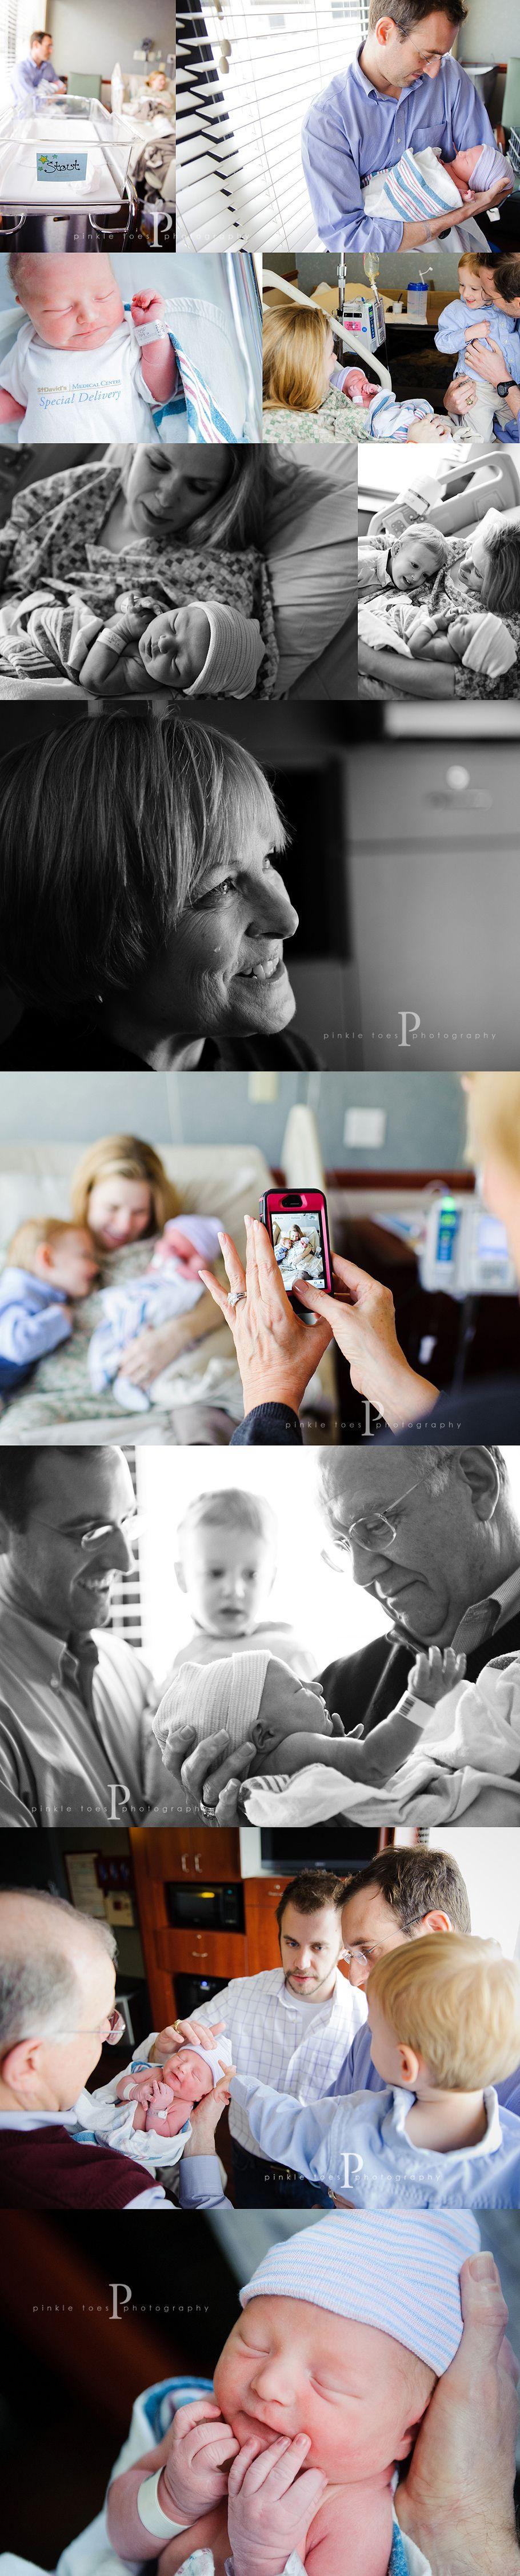 newborn/maternity photo shoot examples